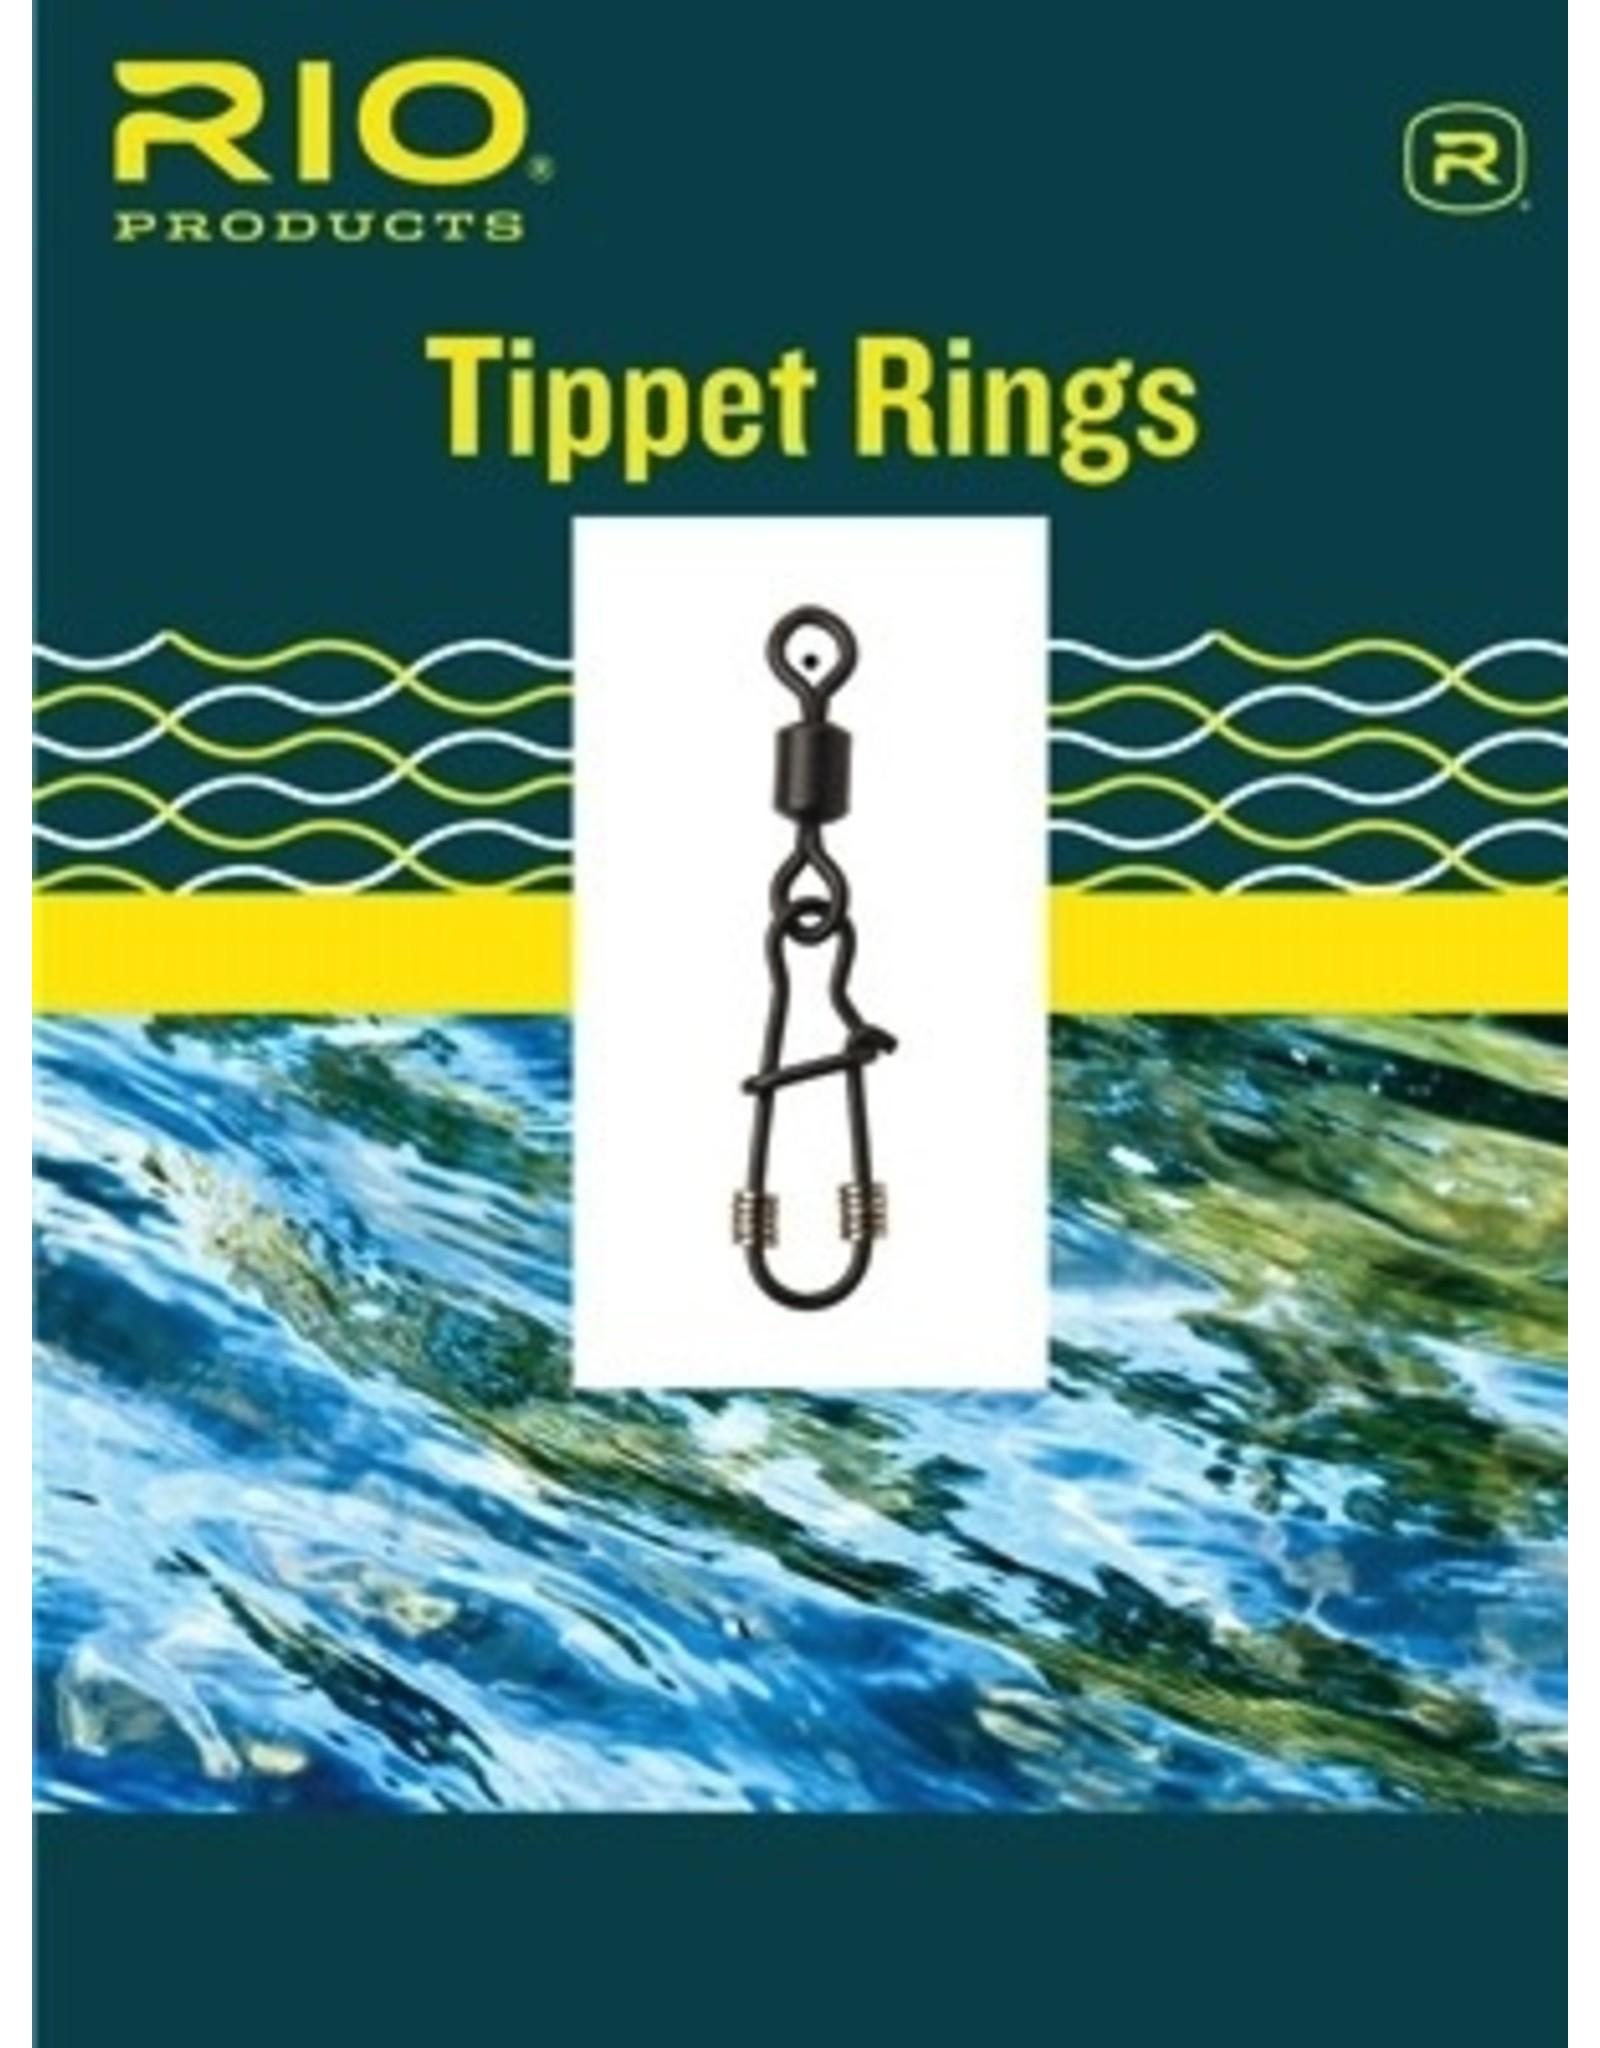 Rio RIO Tippet Rings 2mm